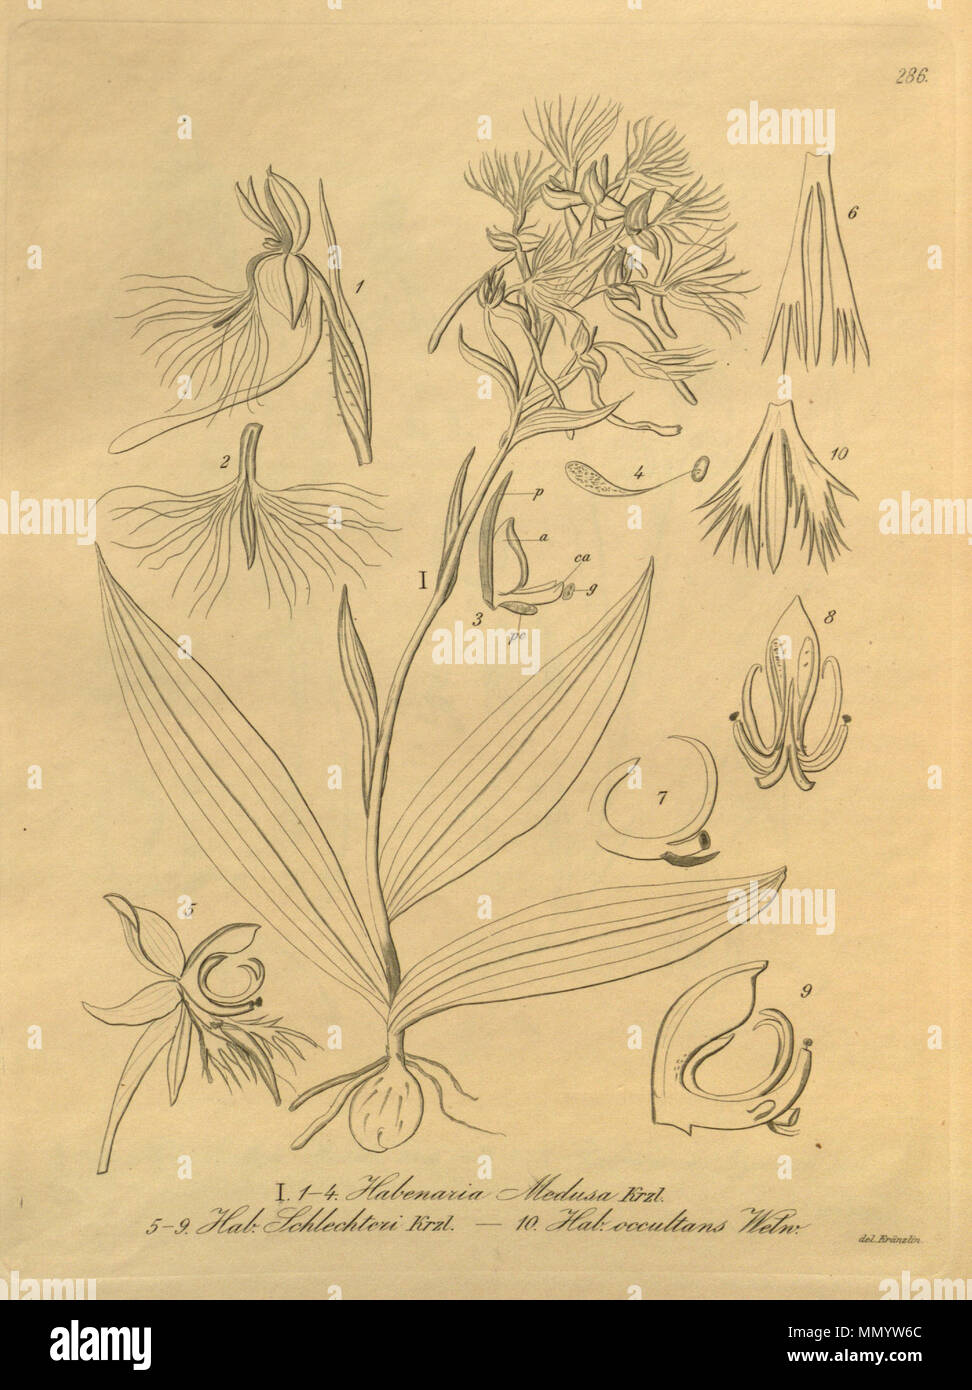 . Illustration of fig. 1-4. Habenaria medusa fig. 5-9. Centrostigma occultans (as syn. Habenaria schlechteri) fig. 10. Centrostigma occultans (as syn. Habenaria occultans)  . 1900 (book), 1896 (this pt.). Friedrich Wilhelm Ludwig Kränzlin (1847-1934) and  Heinrich Gustav Reichenbach (1824–1889)   Alternative names Rchb.f.  Description German-Saxon botanist, pteridologist, ornithologist and university teacher  Date of birth/death 3 January 1824 6 May 1889  Location of birth/death Dresden Hamburg  Work location Leipzig  Authority control  : Q62820 VIAF:?77066171 ISNI:?0000 0000 8396 1069 LCC Stock Photo